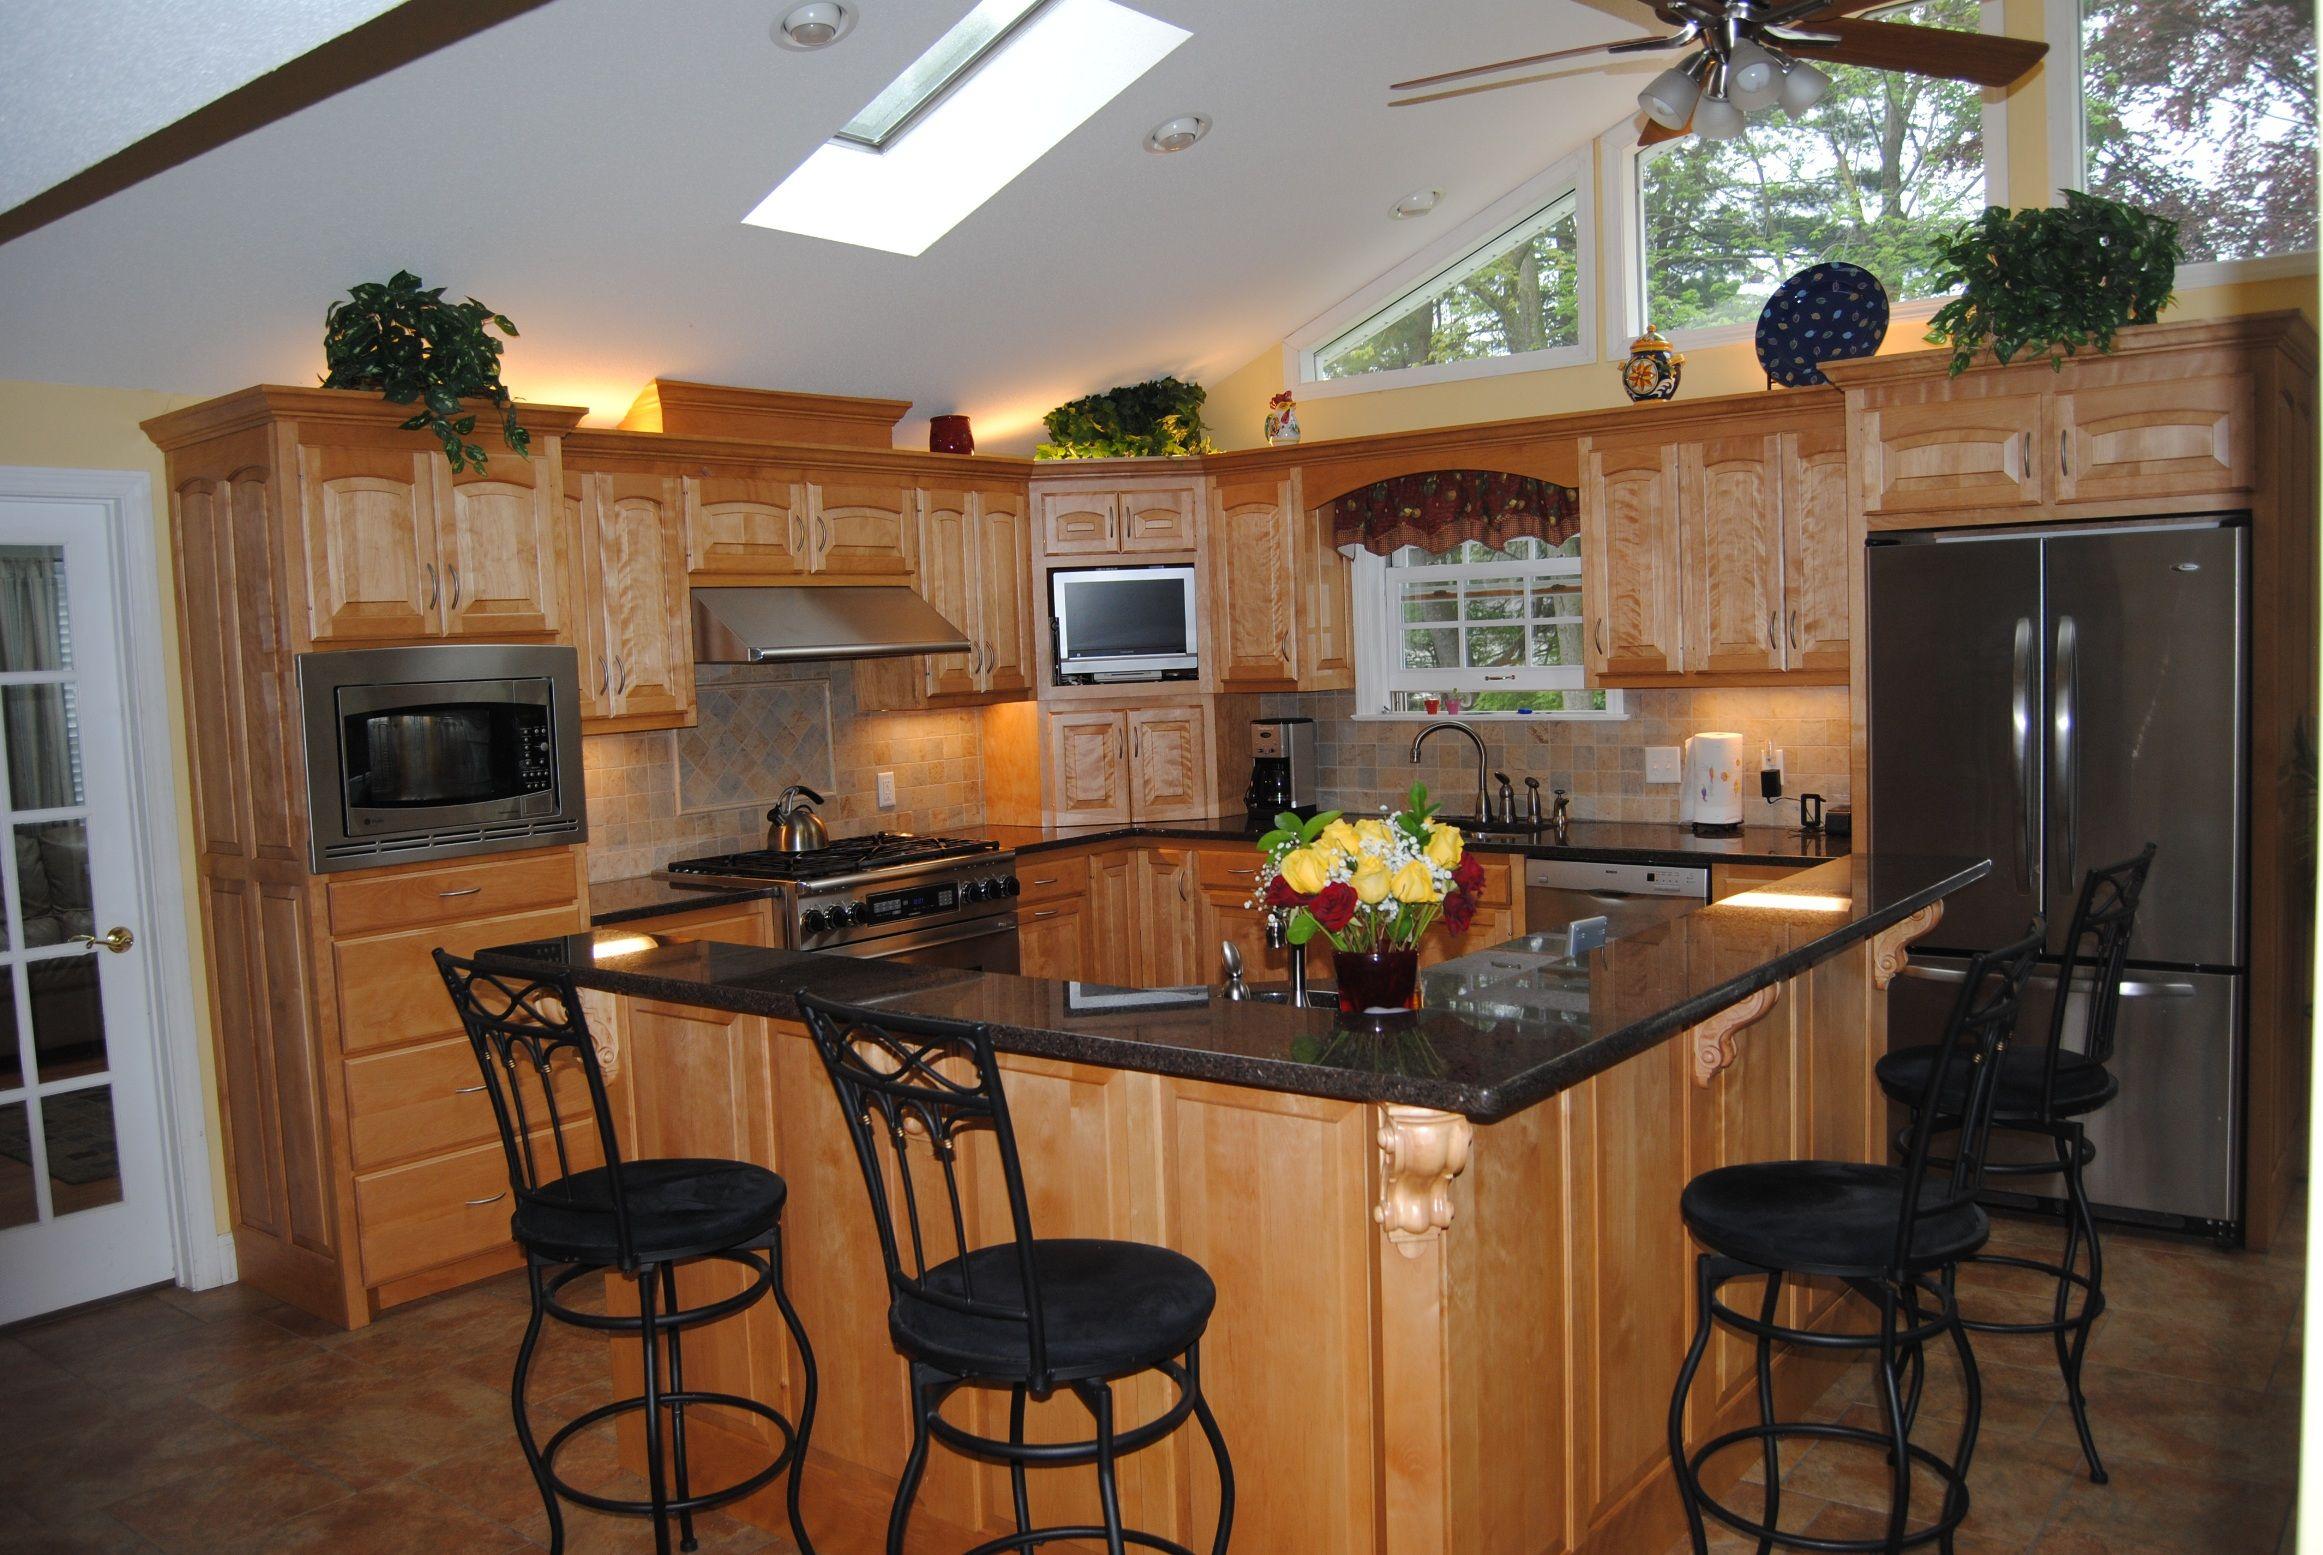 inspiring island designs for small kitchens : kitchen kitchen design